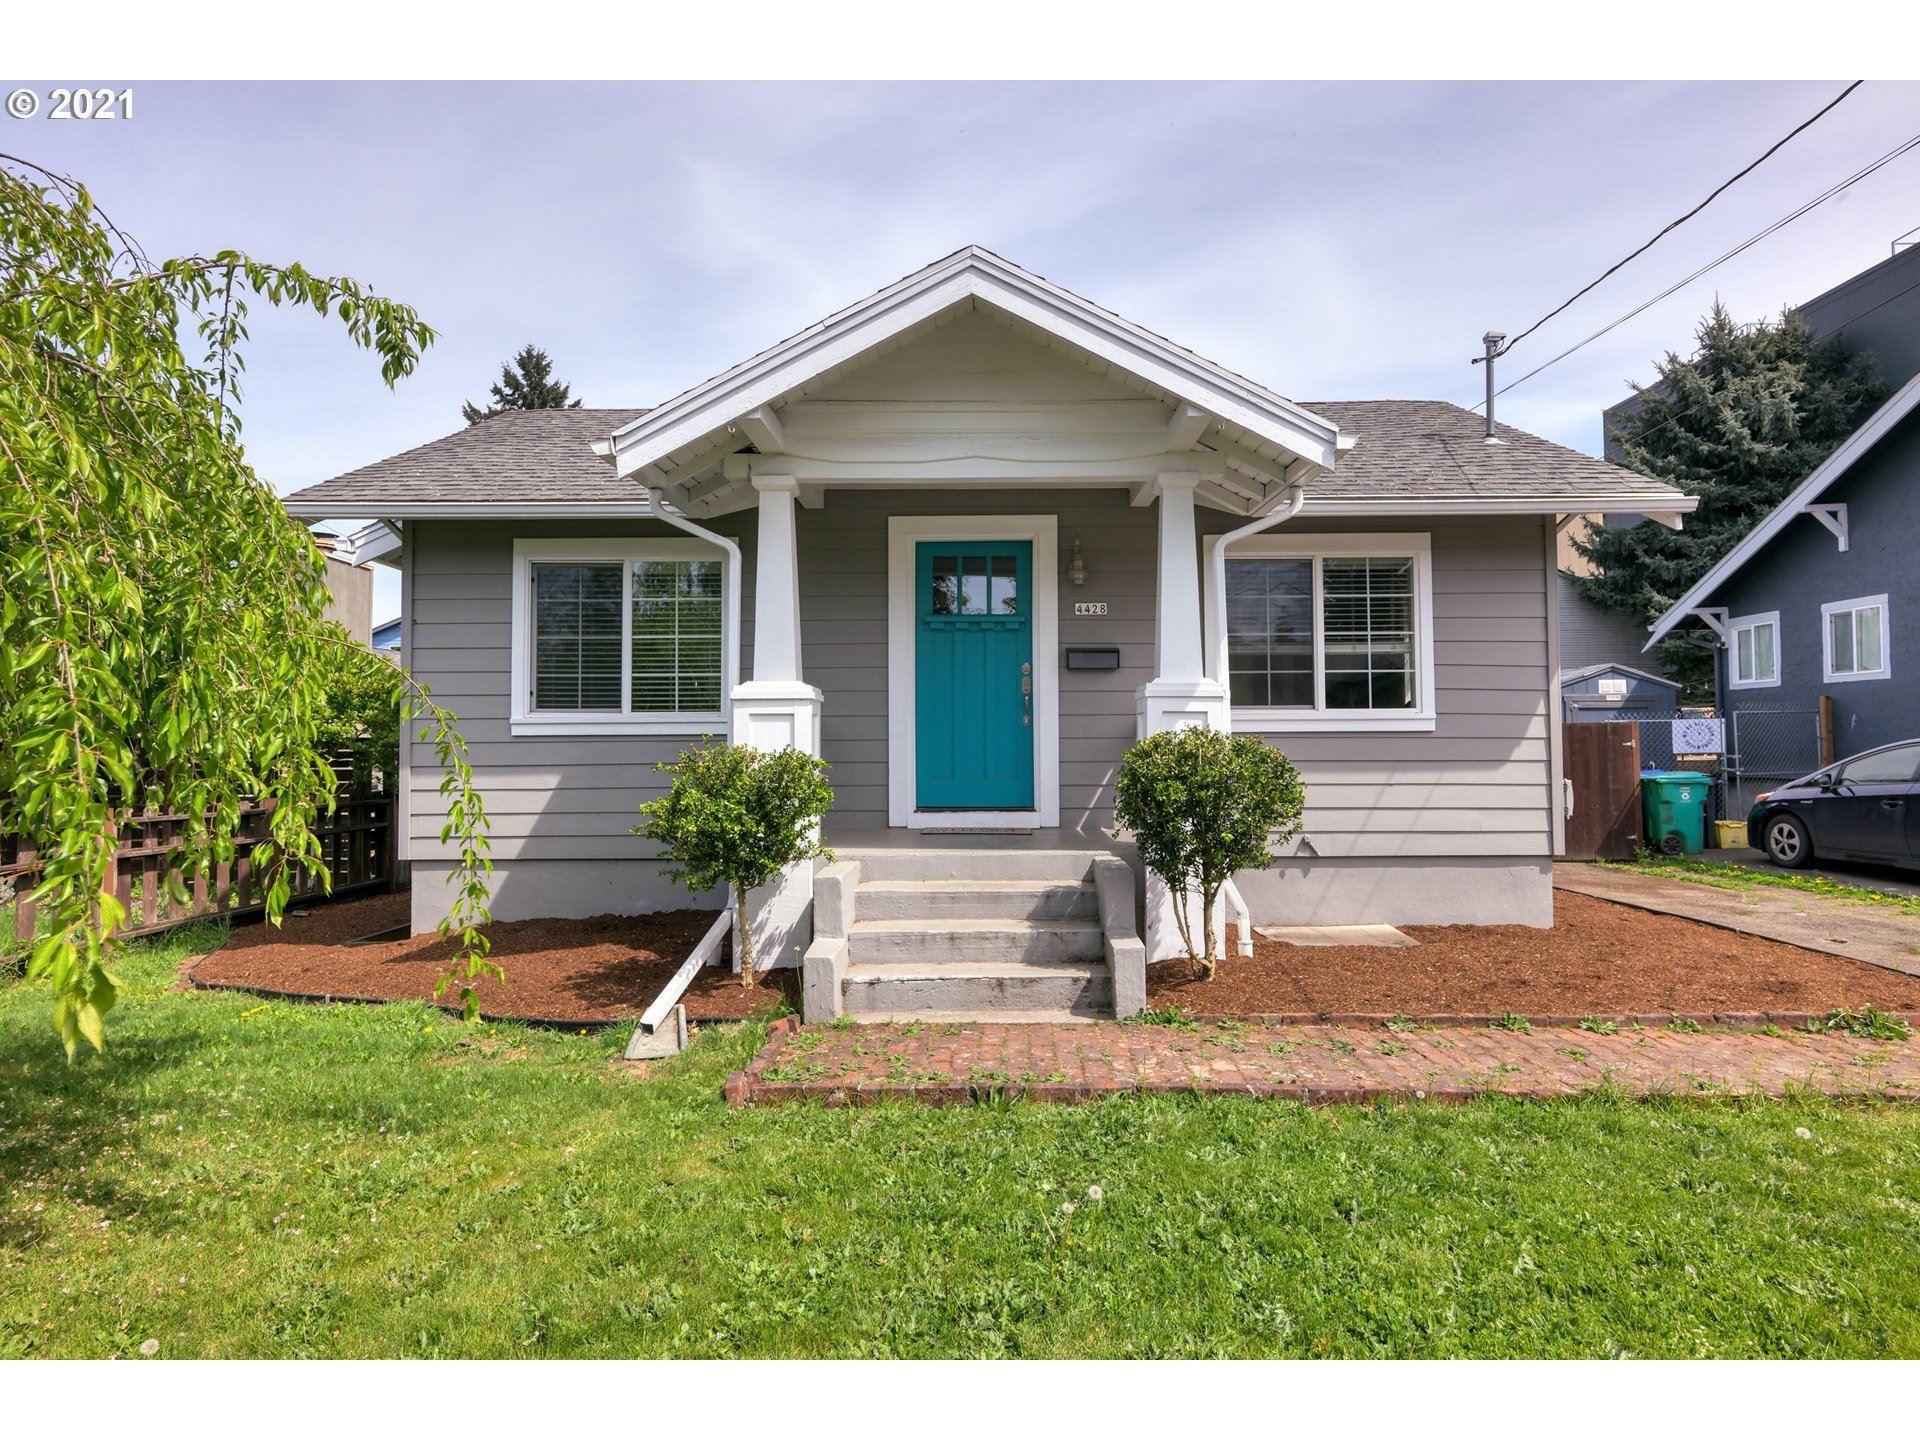 4428 SE 51ST AVE, Portland, OR 97206 - MLS#: 21217688